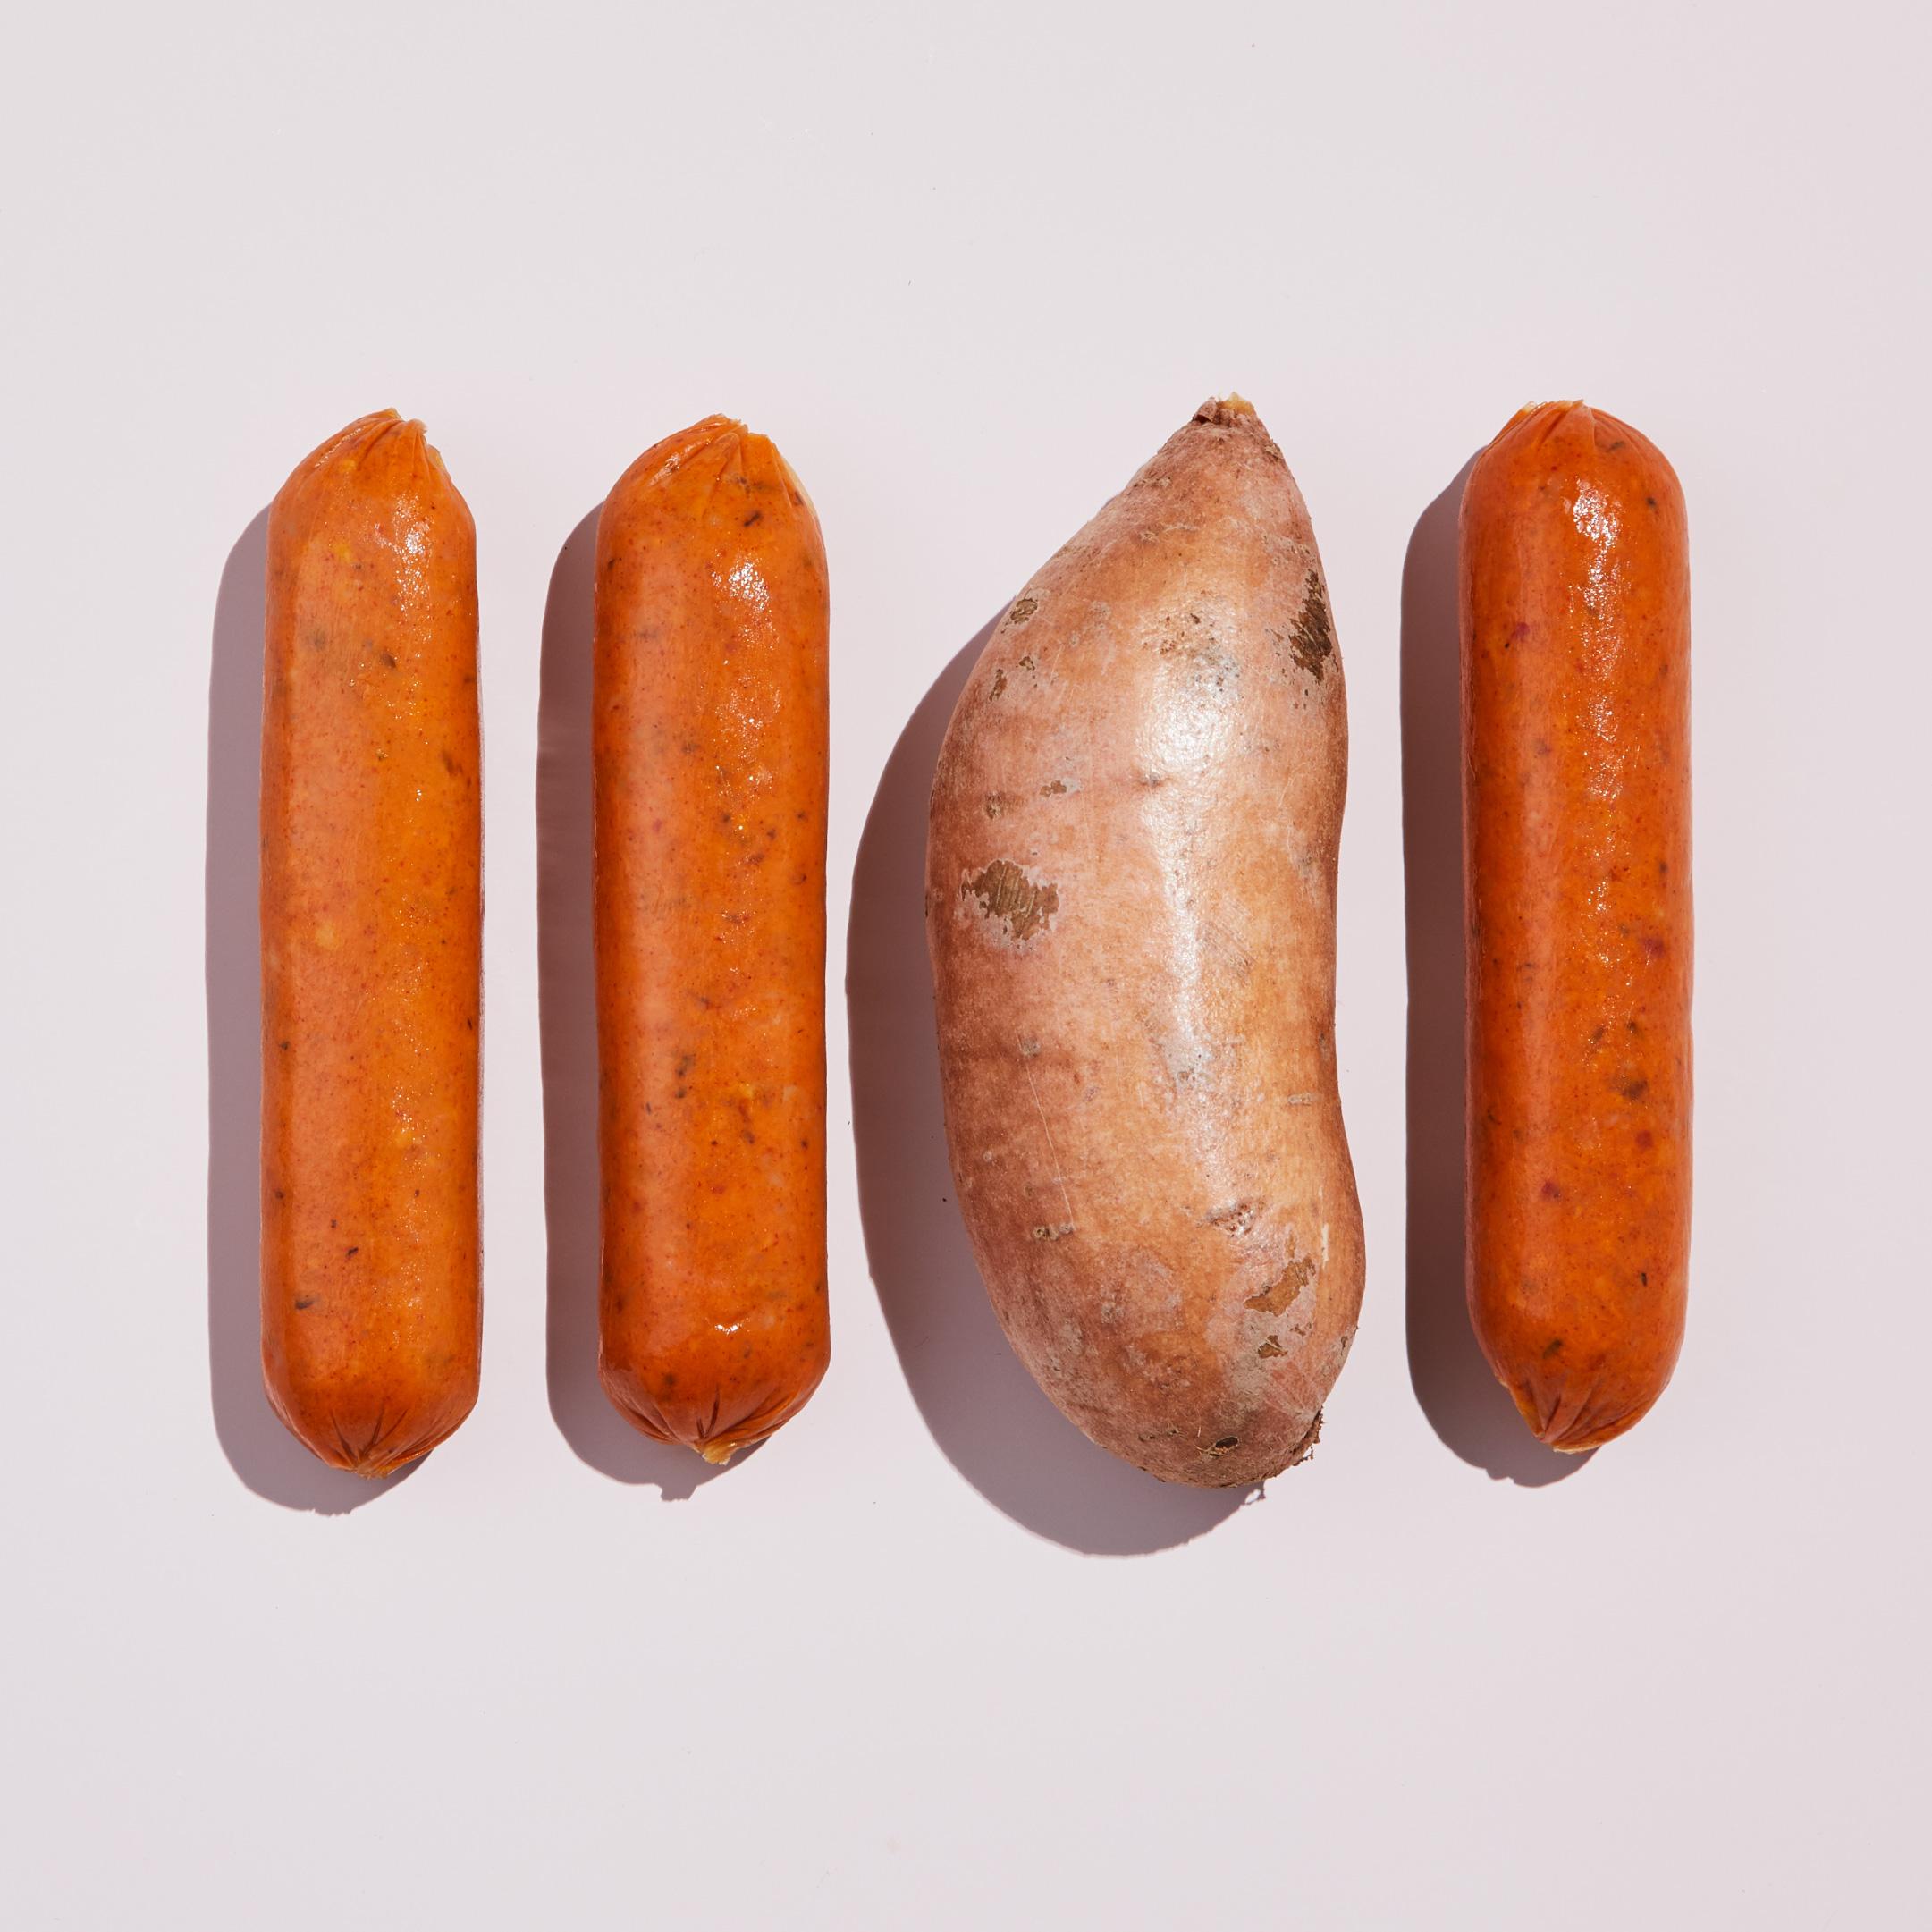 misfit-sausage-sweet-potato-row@2x.jpg